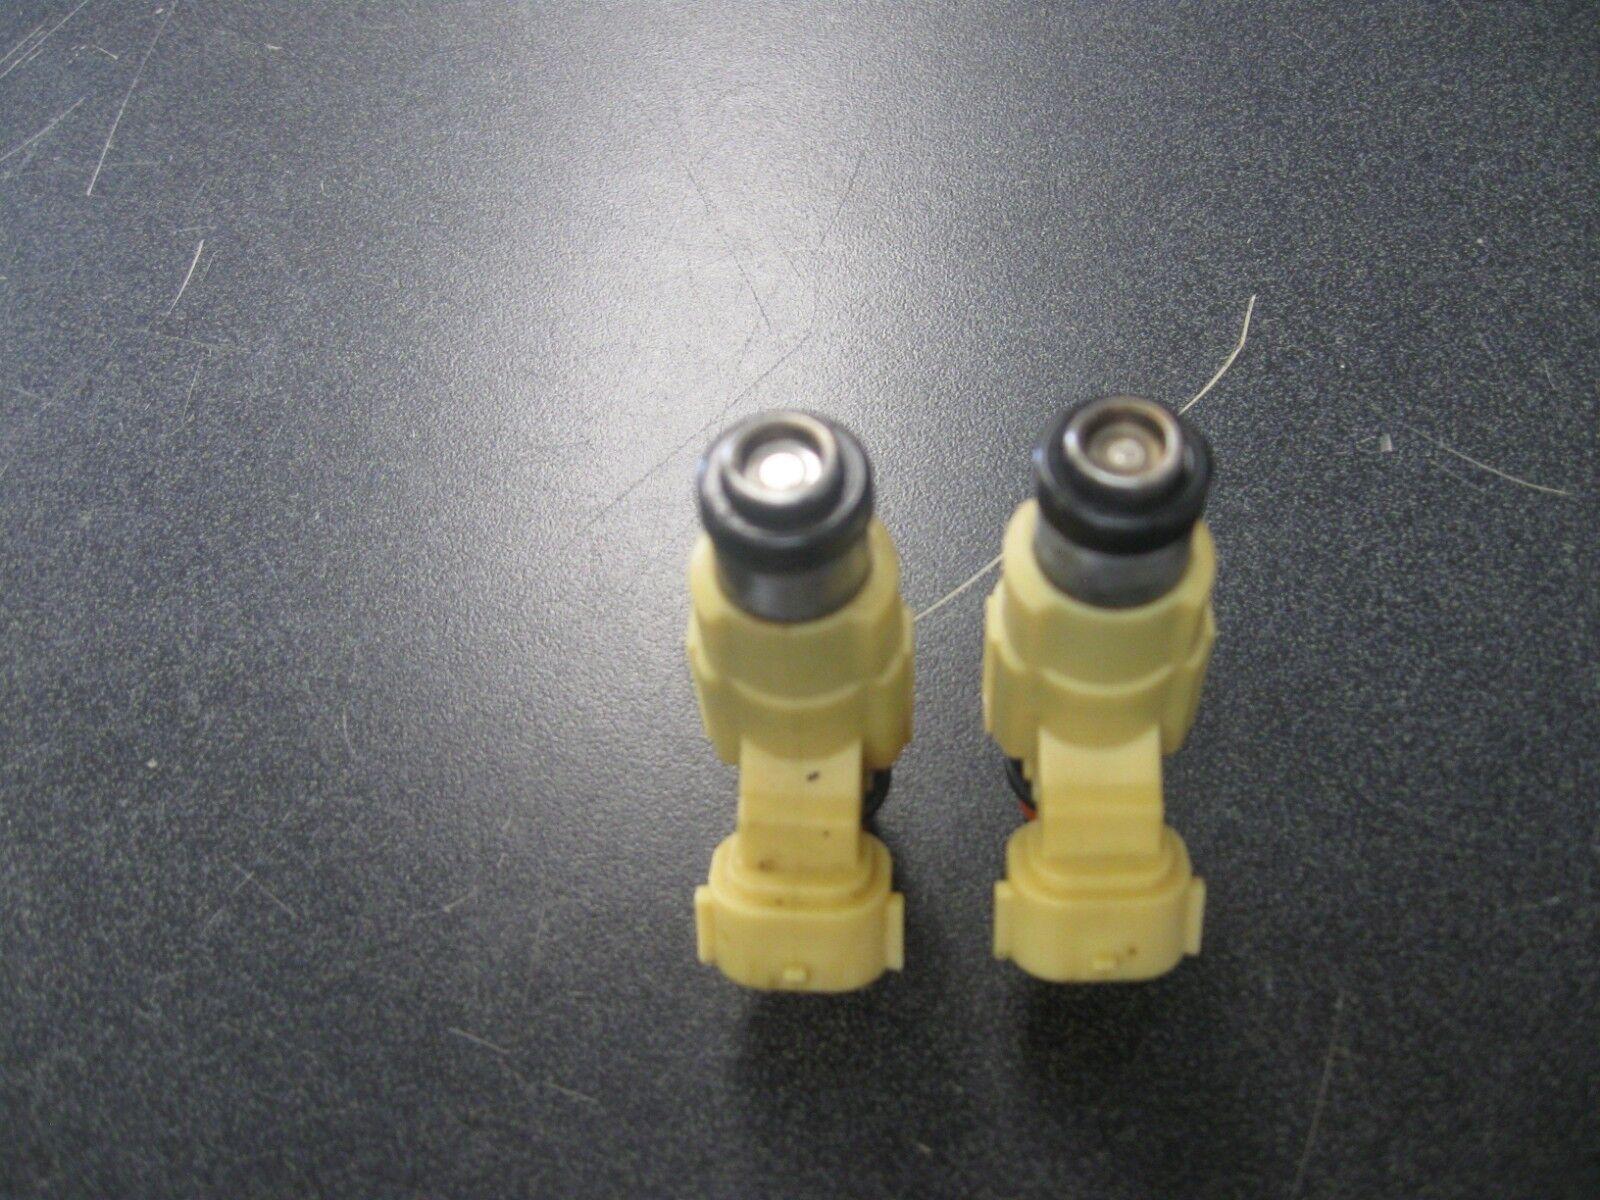 Set Of 2 69J-13761-00-00 Yamaha LF225TURA Kraftstoffeinspritzer 69J-13761-00-00 2 6298da